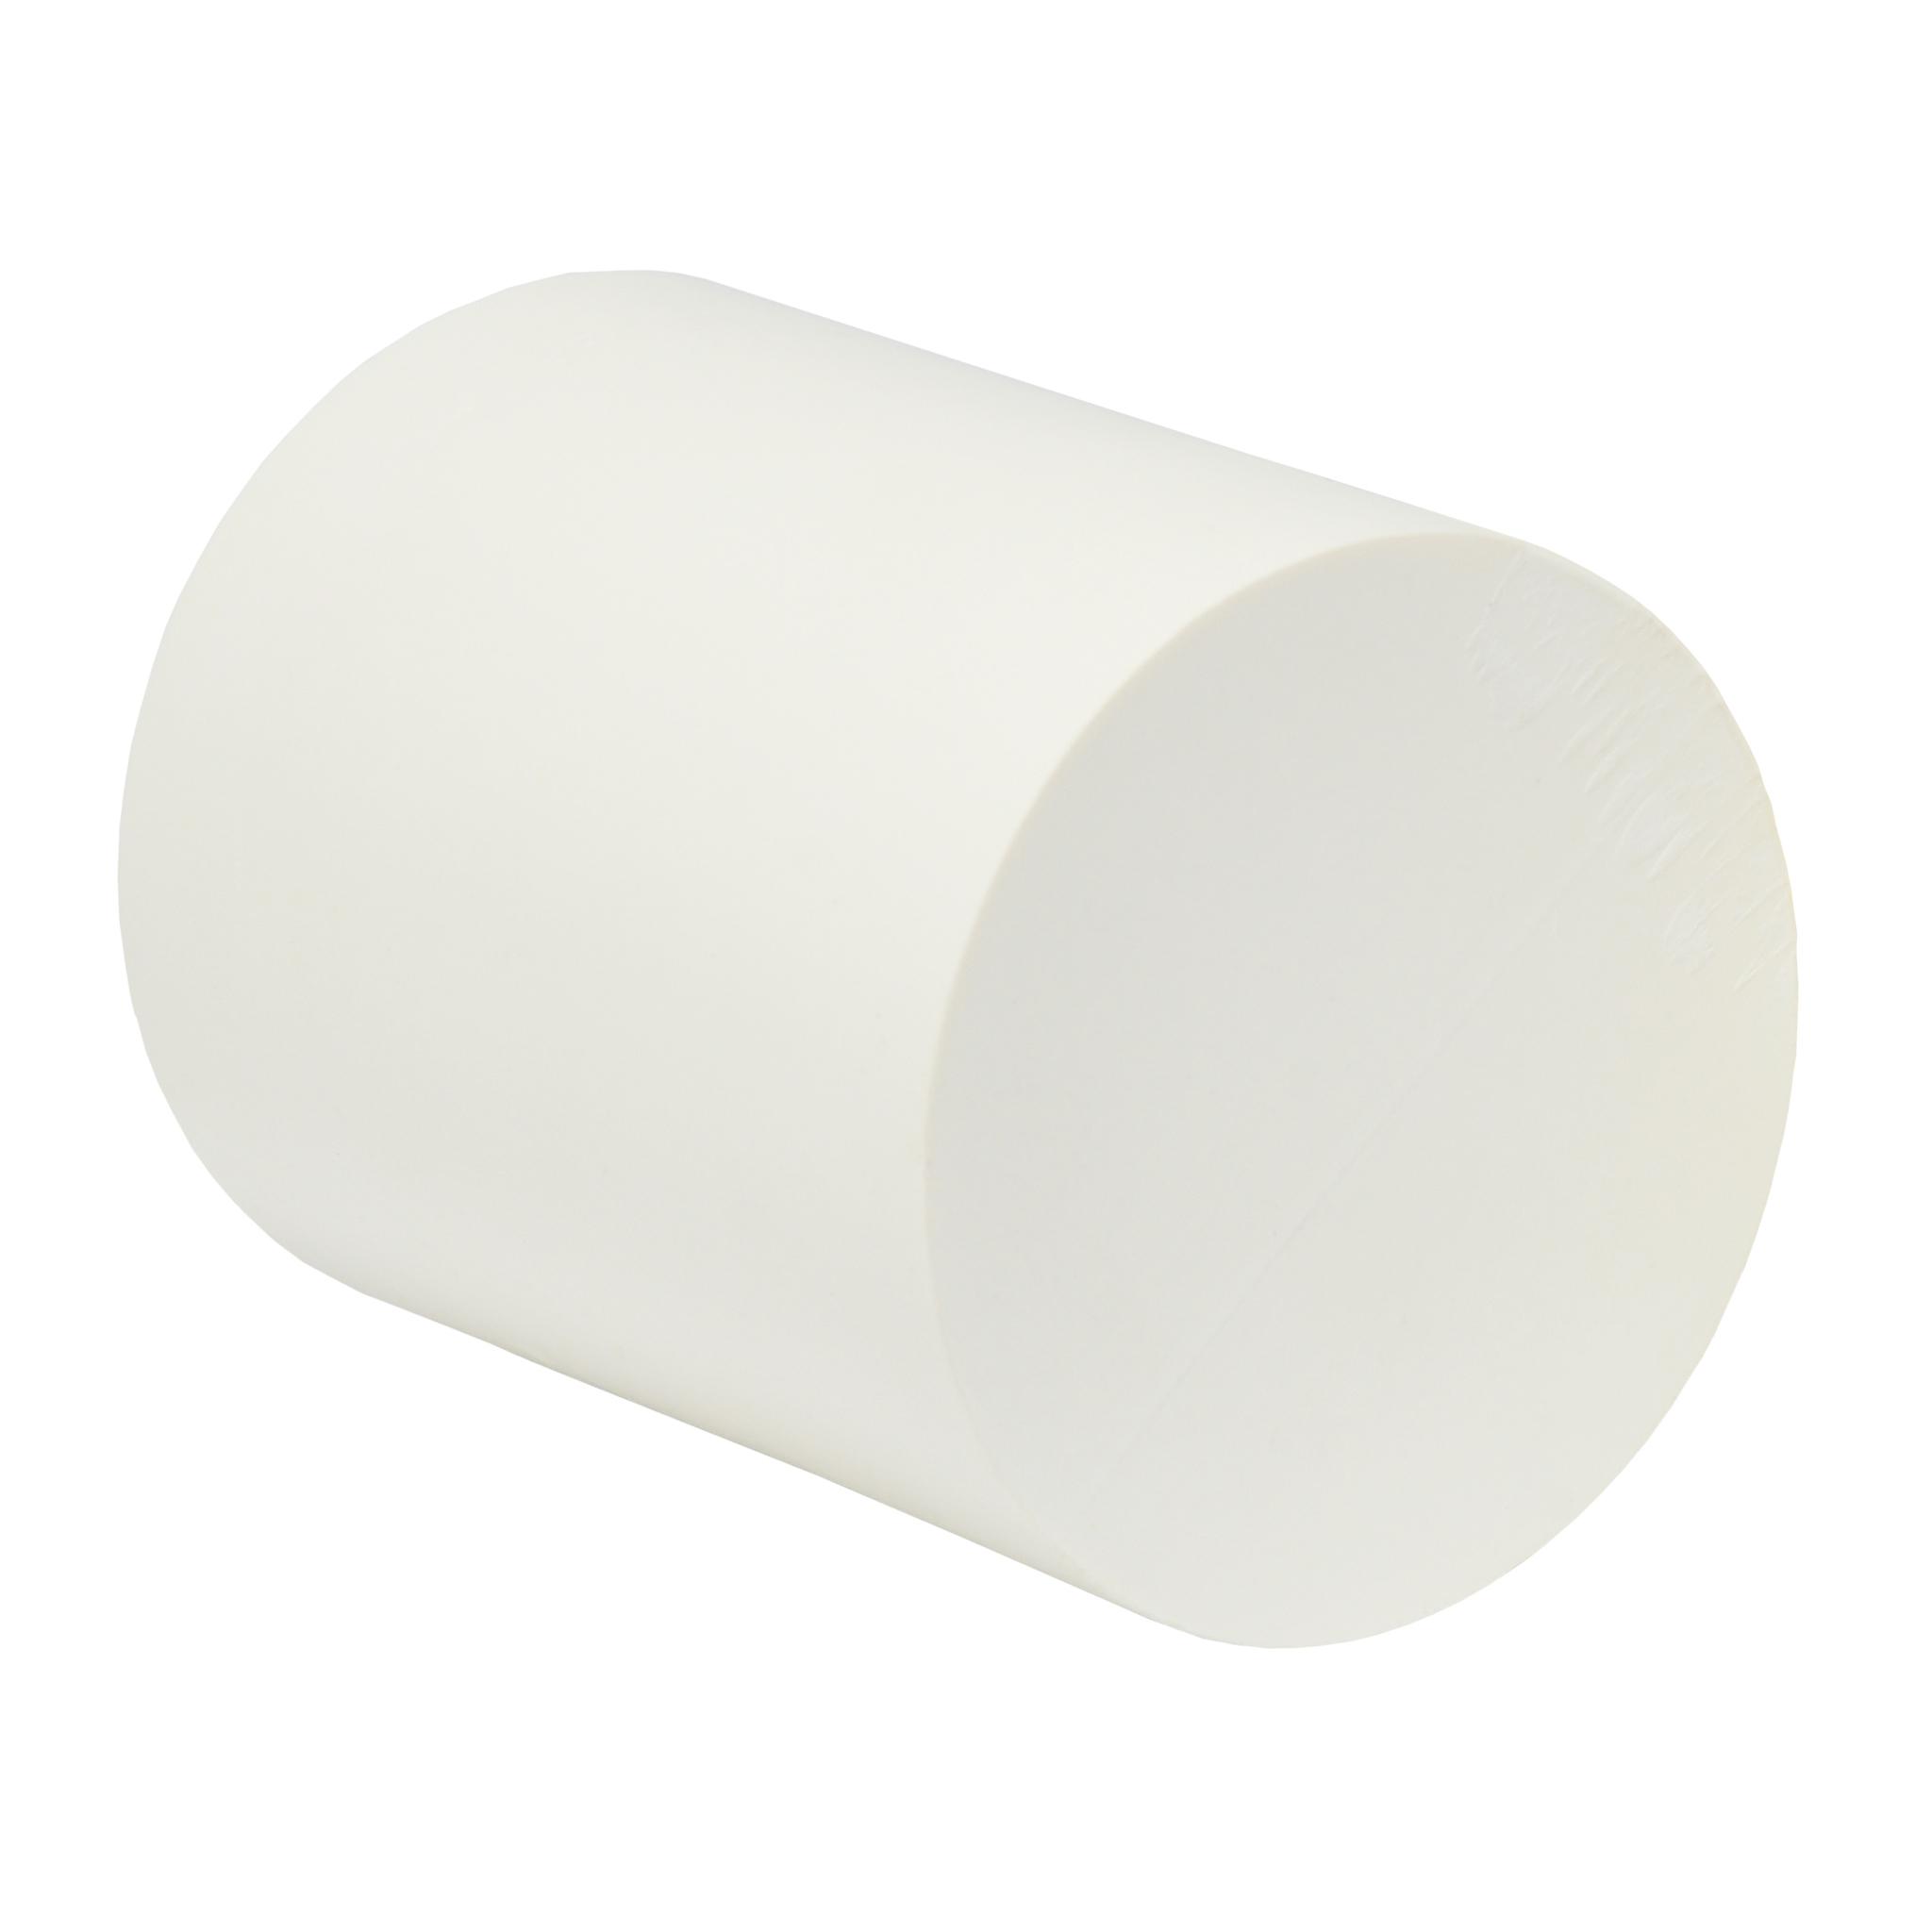 HRANITHERM 603.01 White - EVA Hot Melt Cartridge